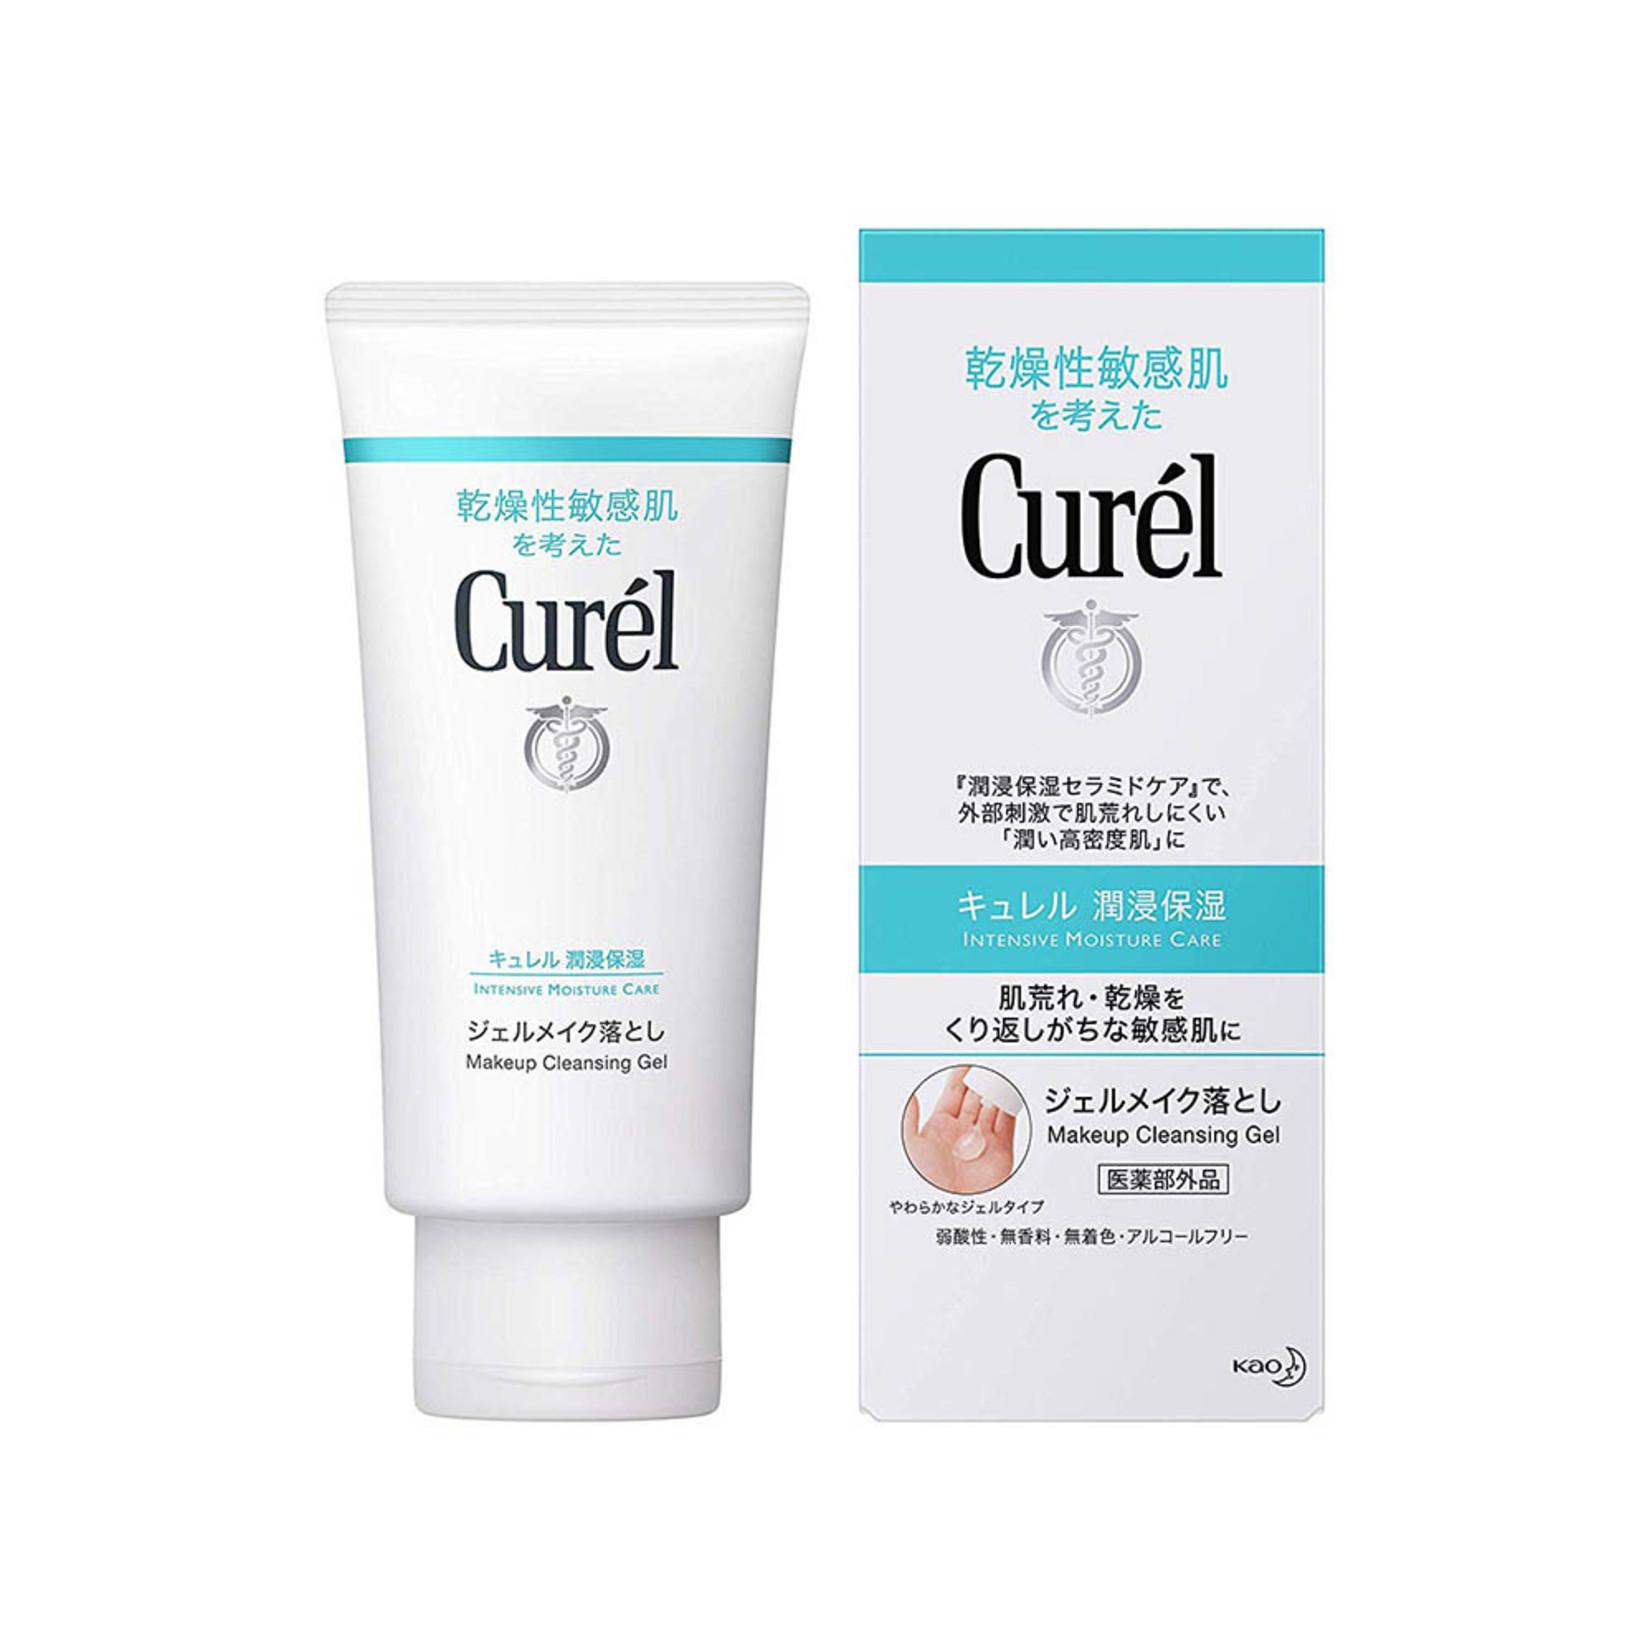 Kao Kao Curél Intensive Moisture Care Makeup Cleansing Gel